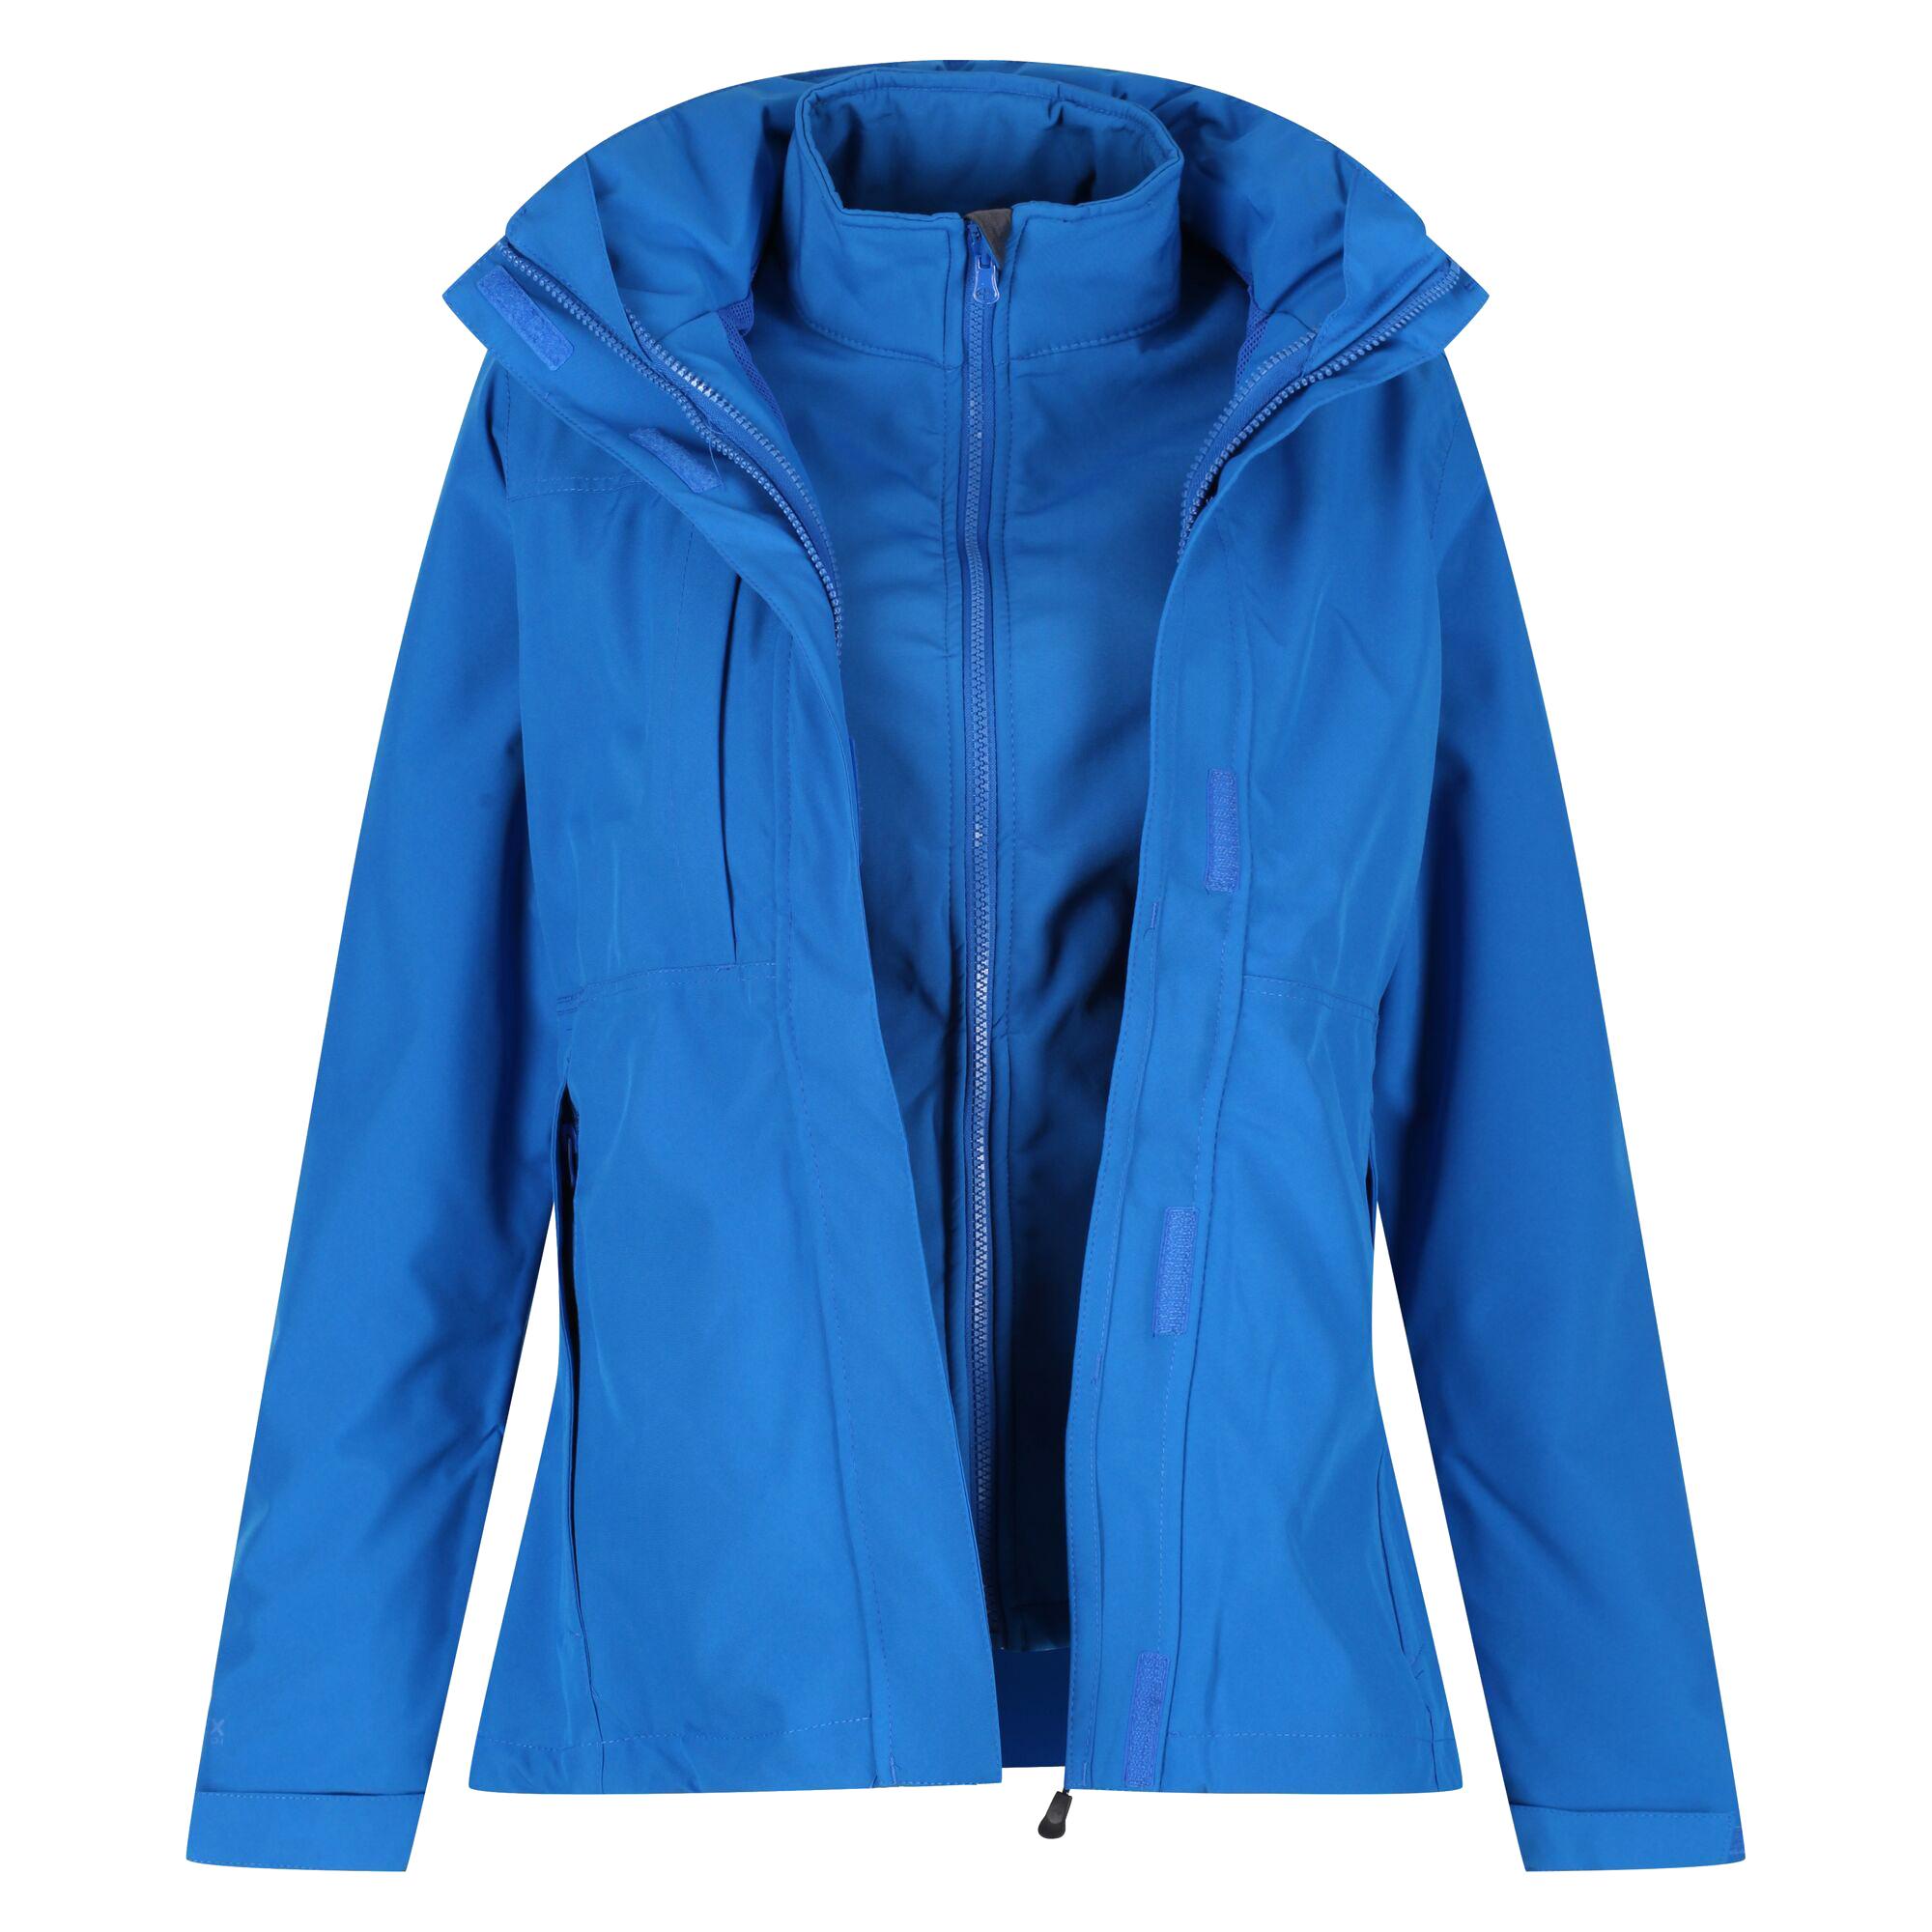 Regatta Professional Womens/Ladies Kingsley 3-in-1 Waterproof Jacket (16) (Oxford Blue)